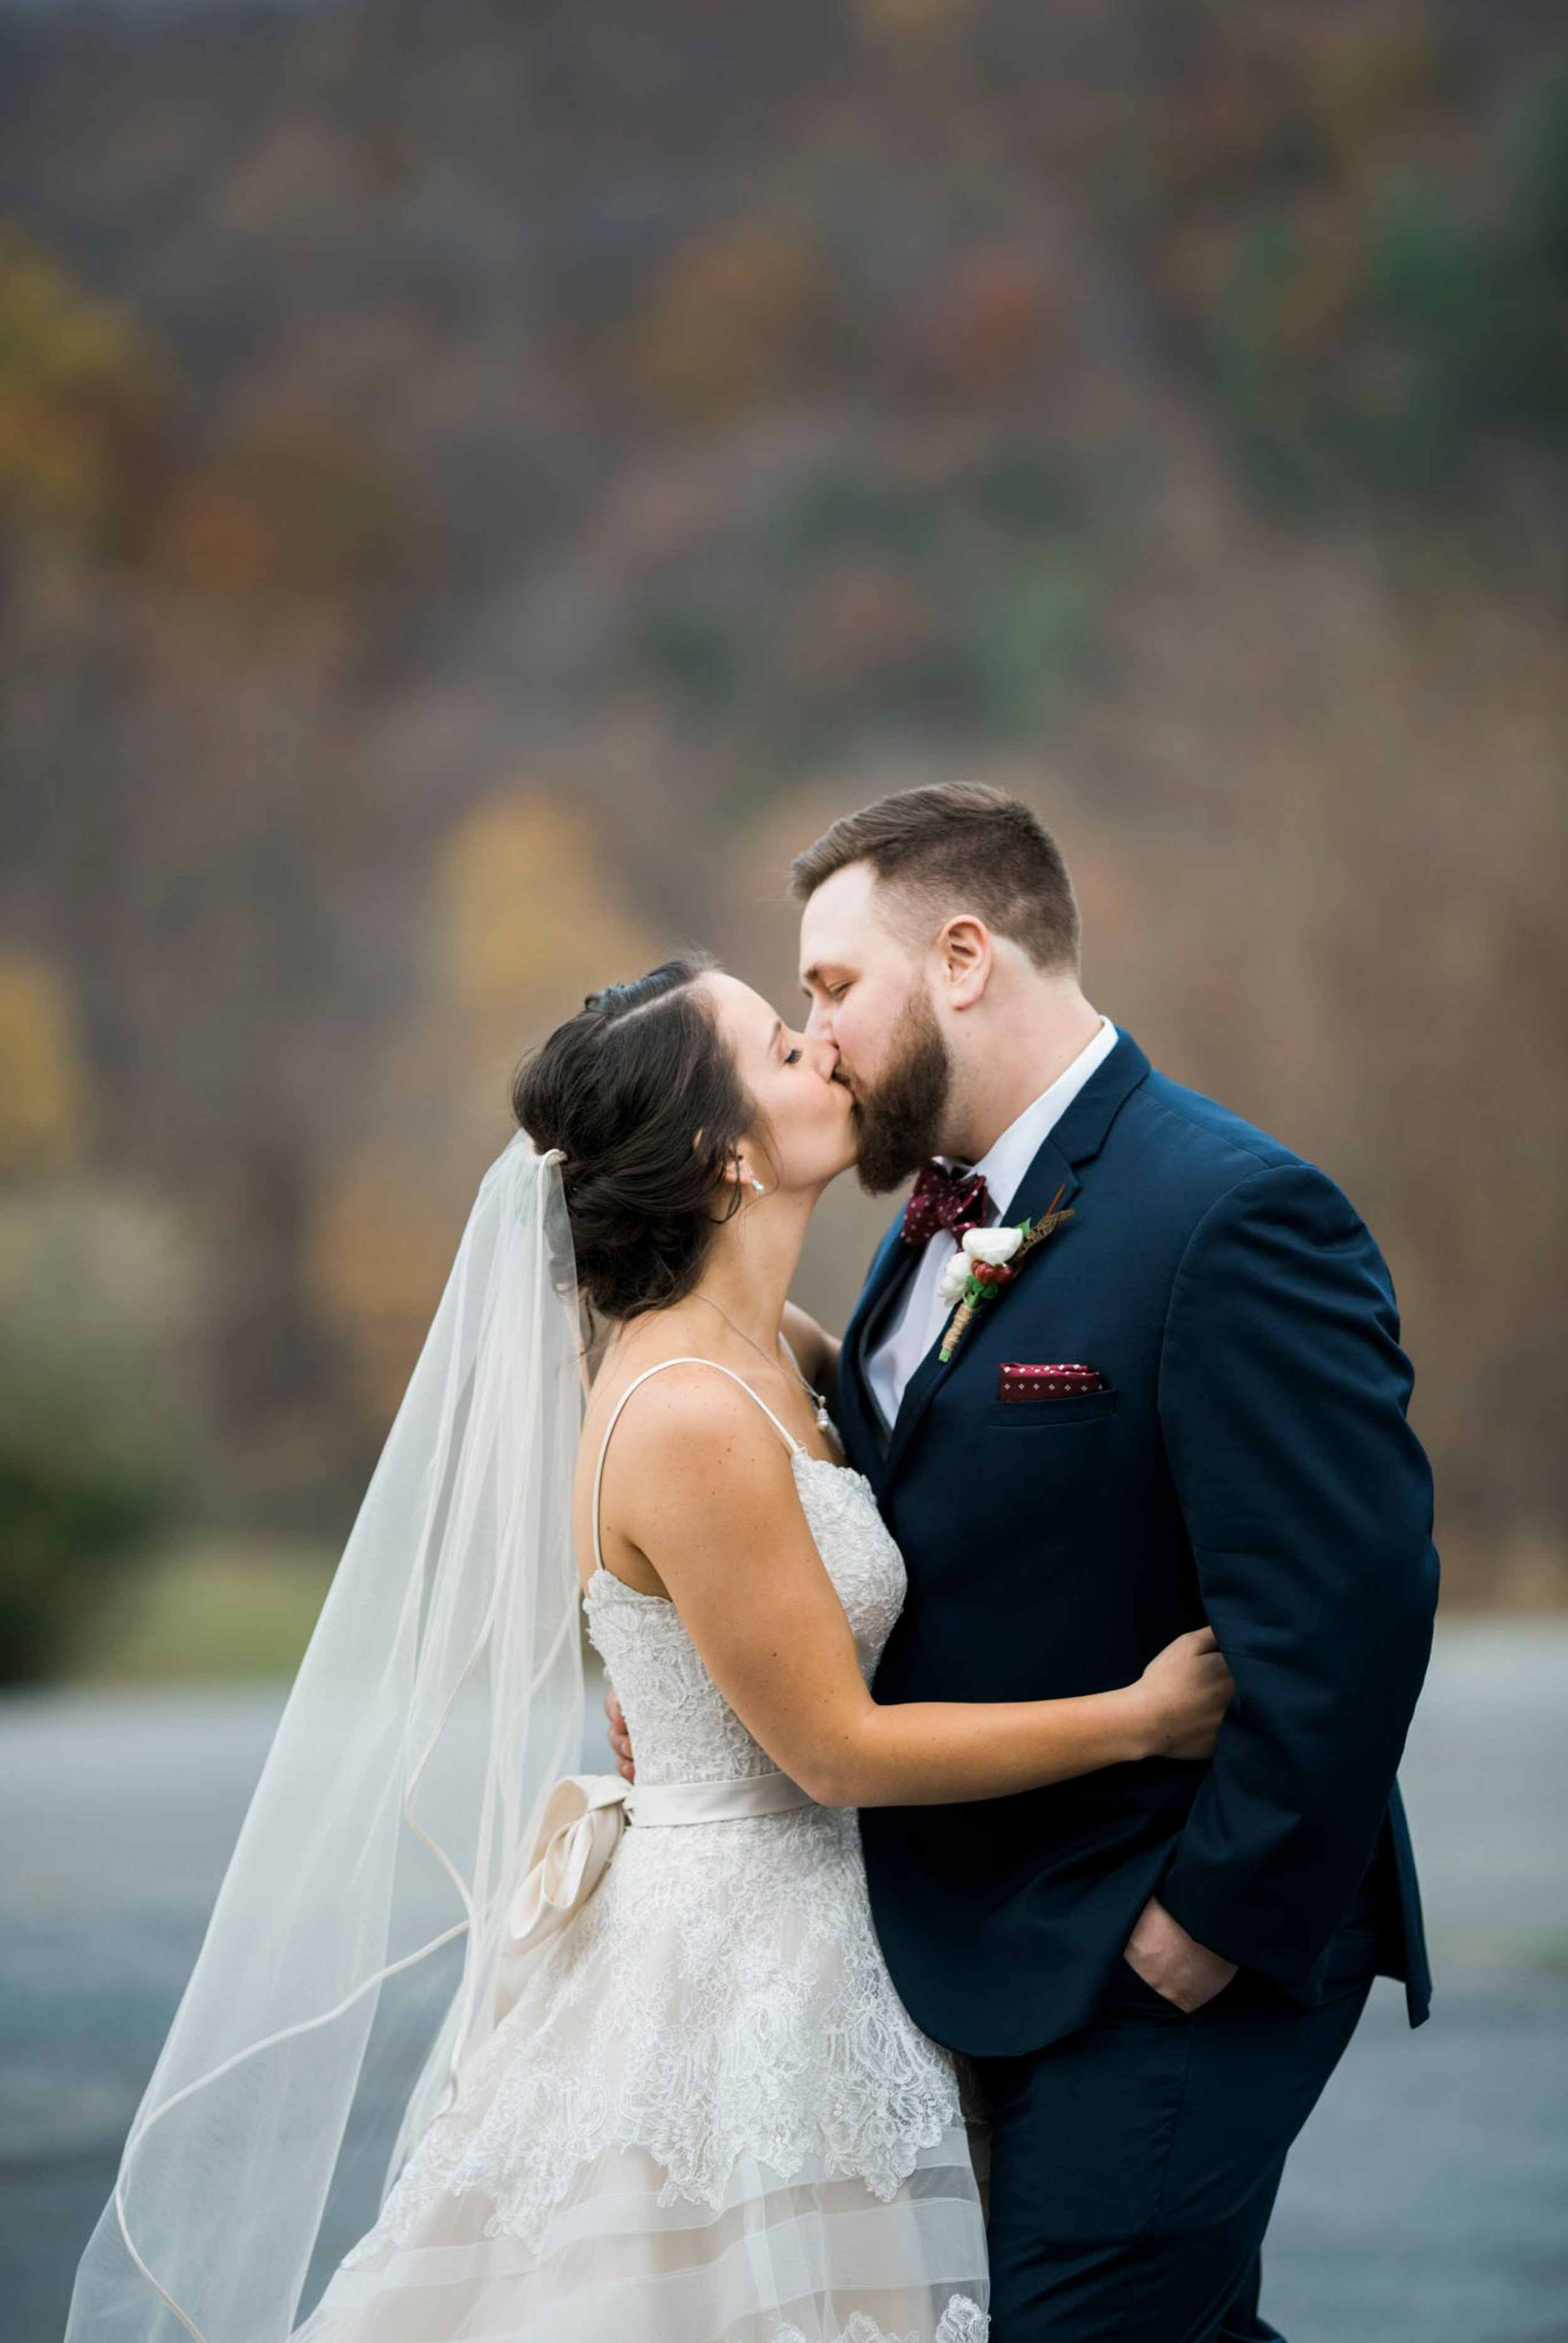 IrvineEstate_LexingtonVA_Wedding_FallWedding_VirginiaWeddingPhotographer 93.jpg